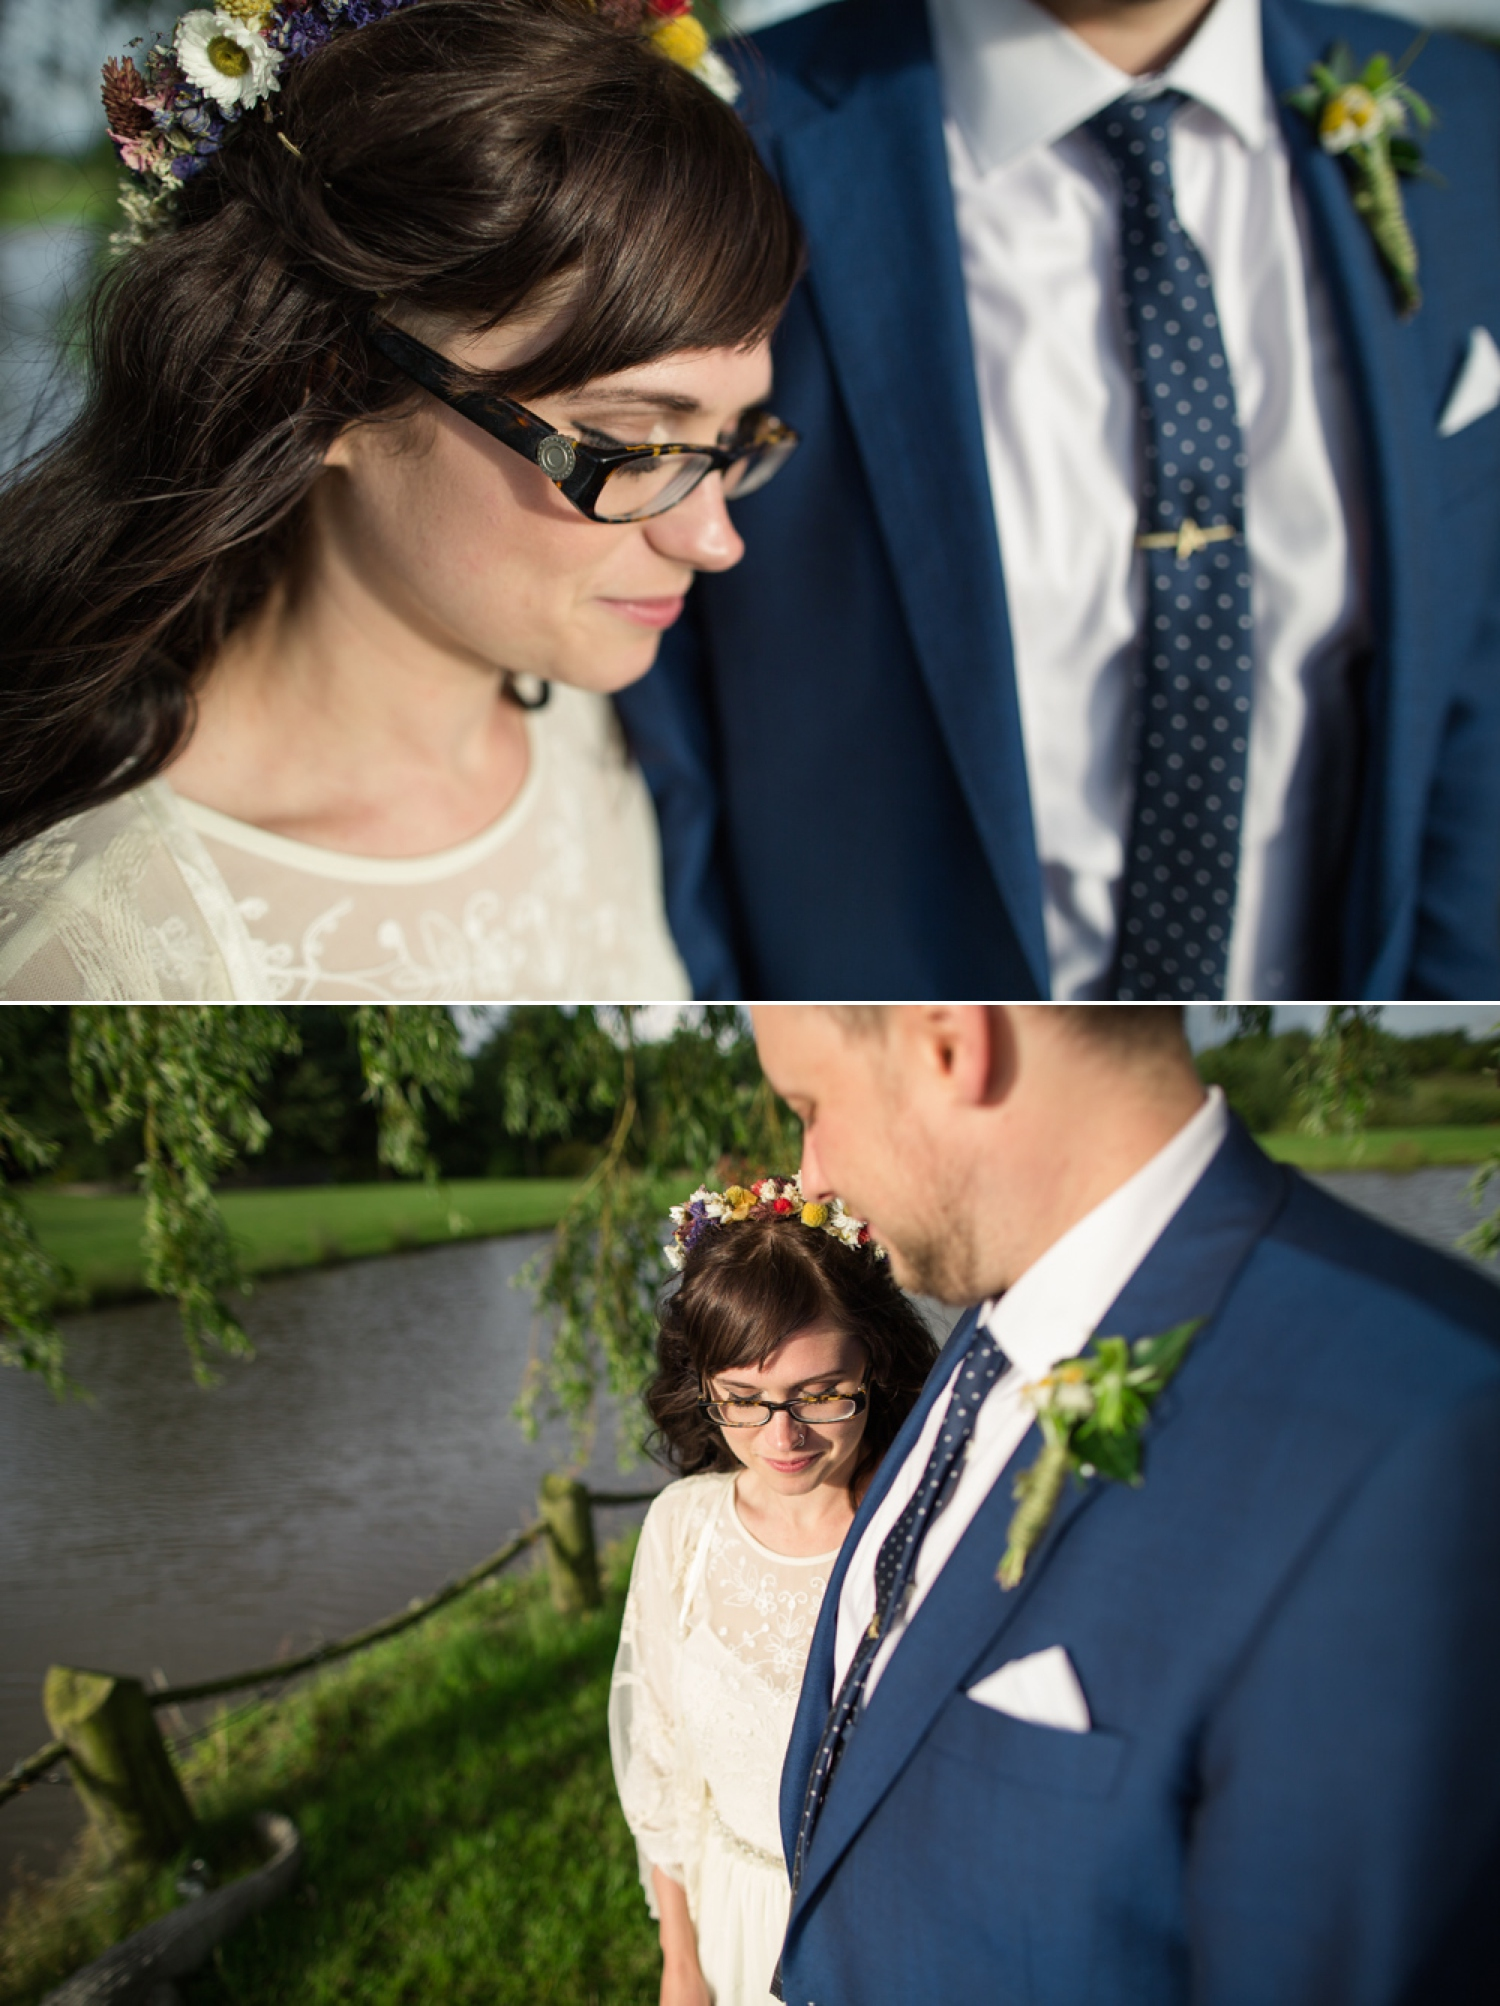 Cheshire Wedding Photographer Elly & Liam_0032